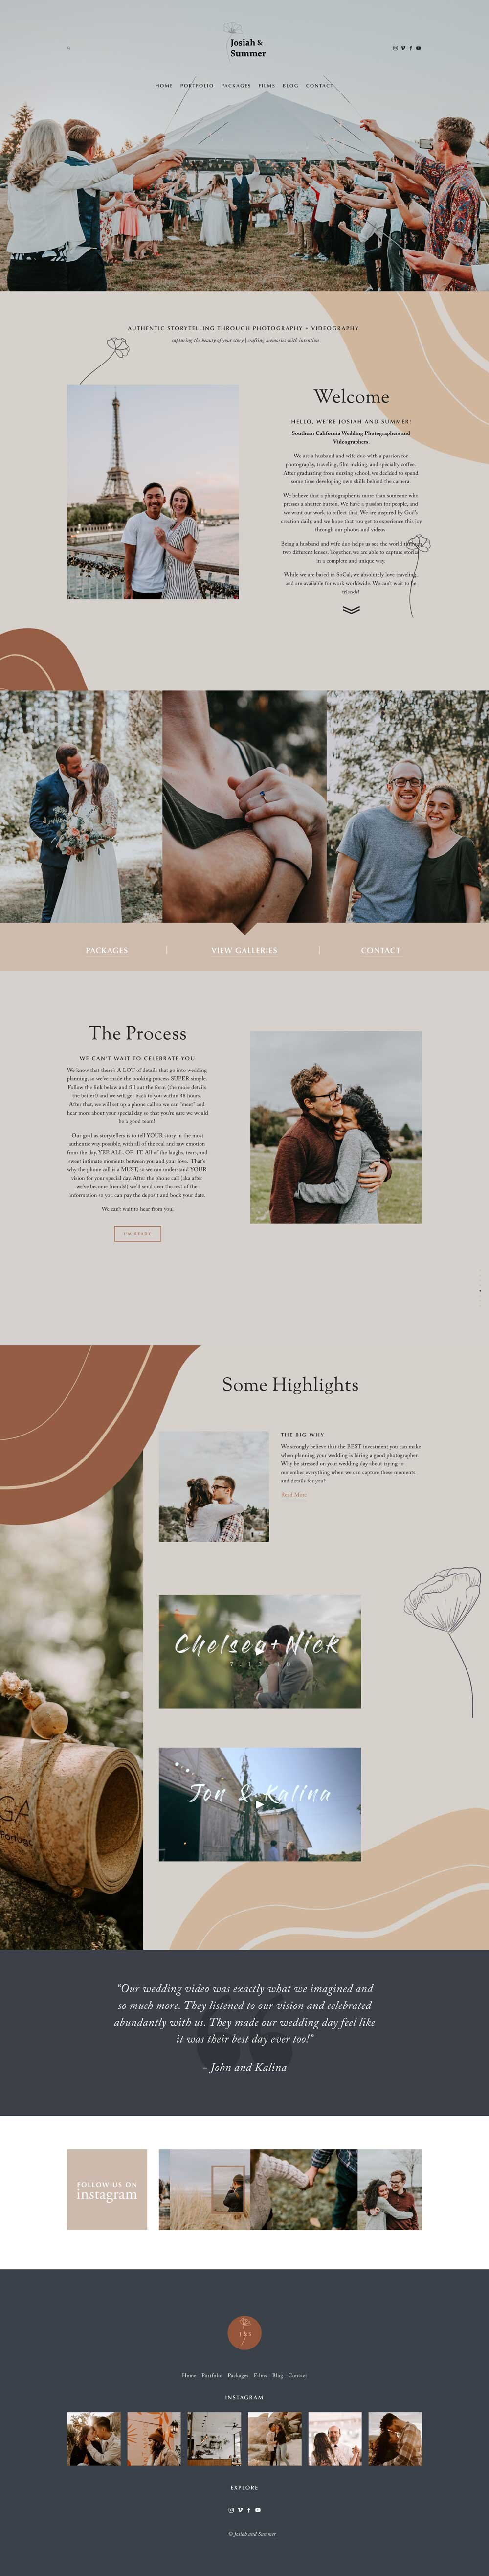 Big-Cat-Creative-Squarespace-Website-Template-Kits-Sophie-Showcase4.jpg